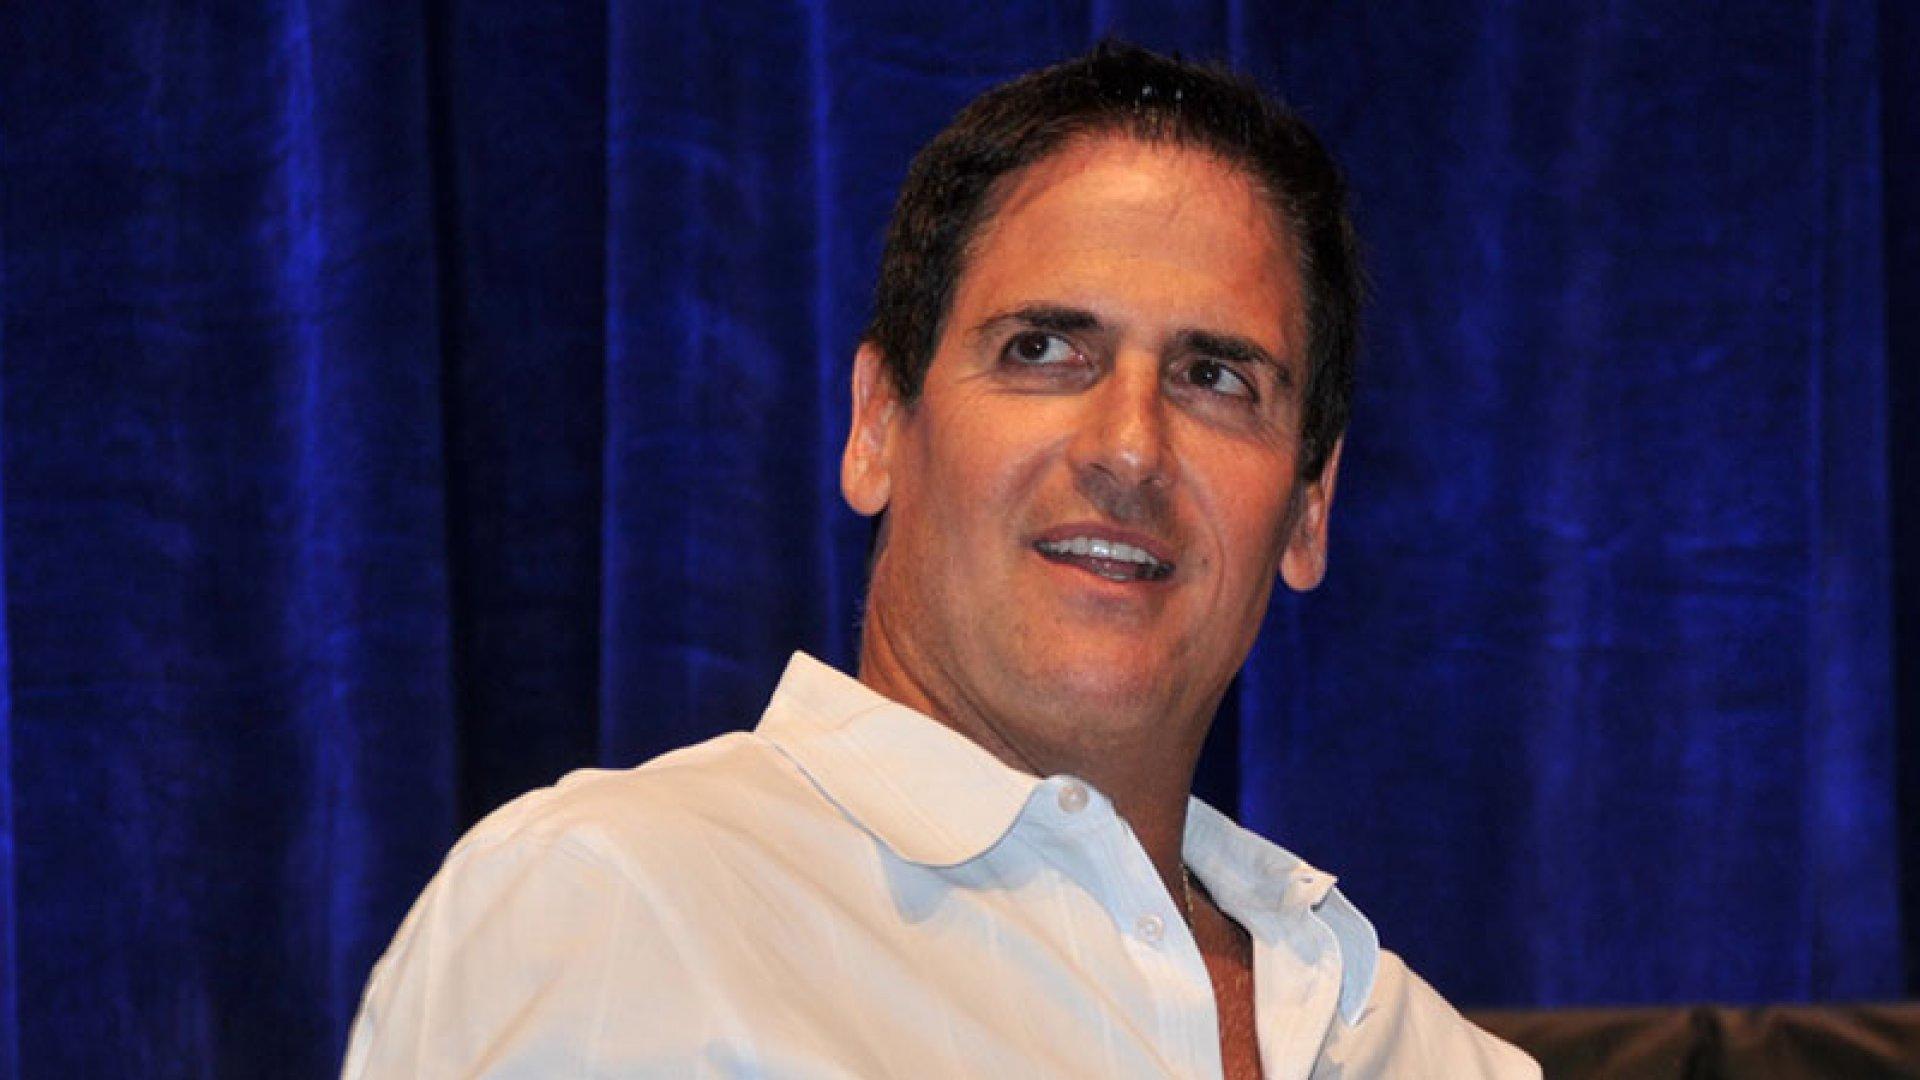 Mark Cuban Made <em>Shark Tank</em> Change Its Contracts